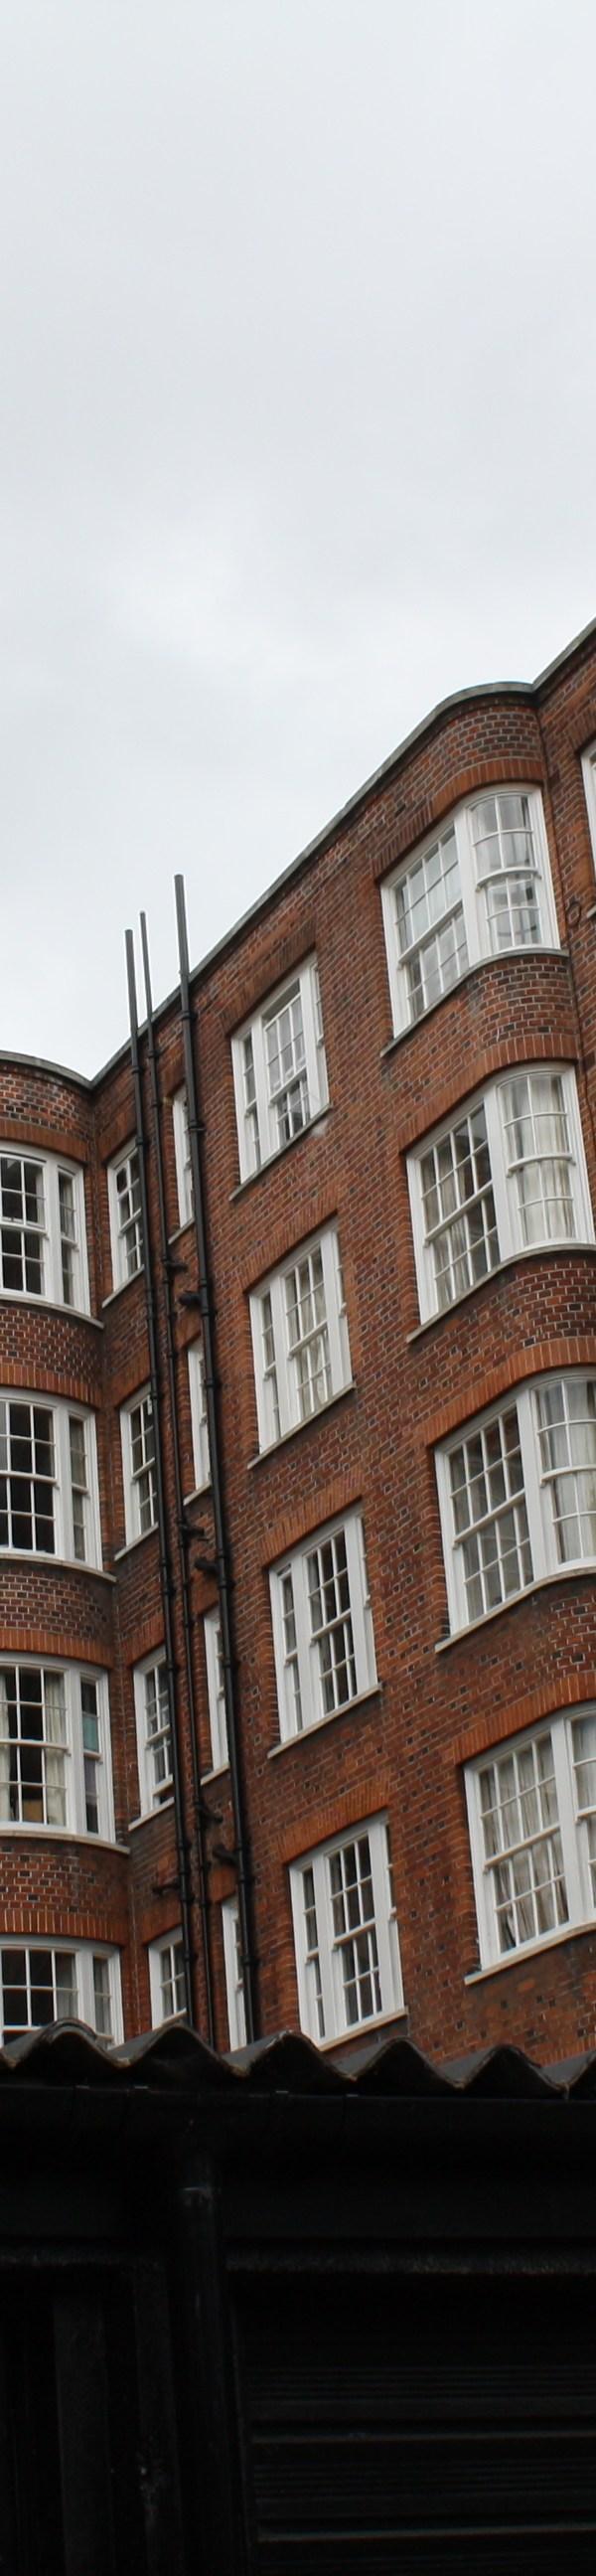 london brown brick buildings